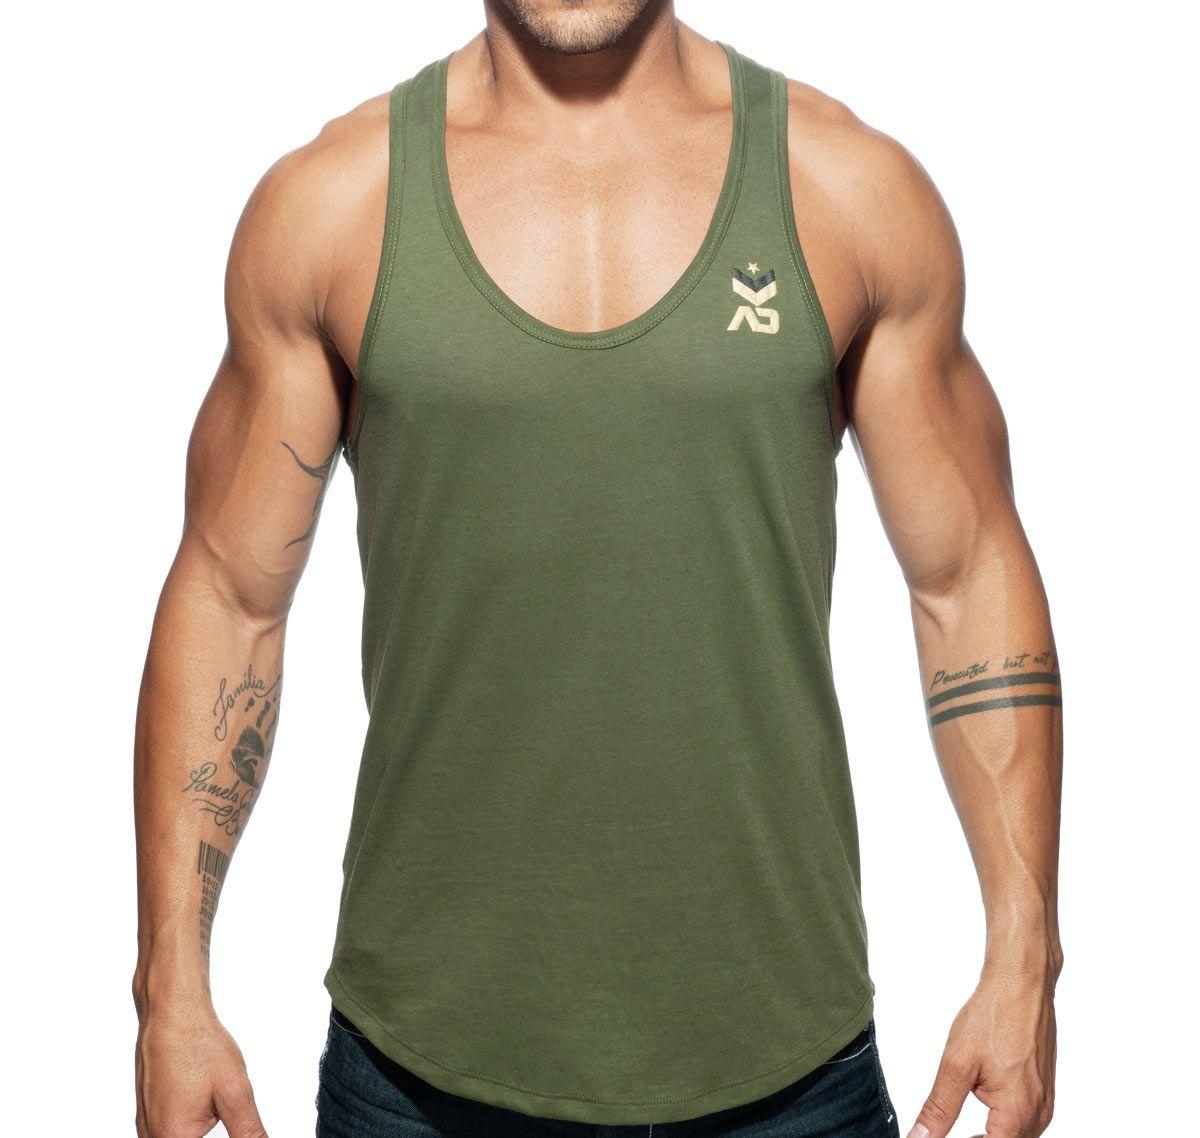 Addicted Sportshirt MILITARY TANK TOP AD611, grün